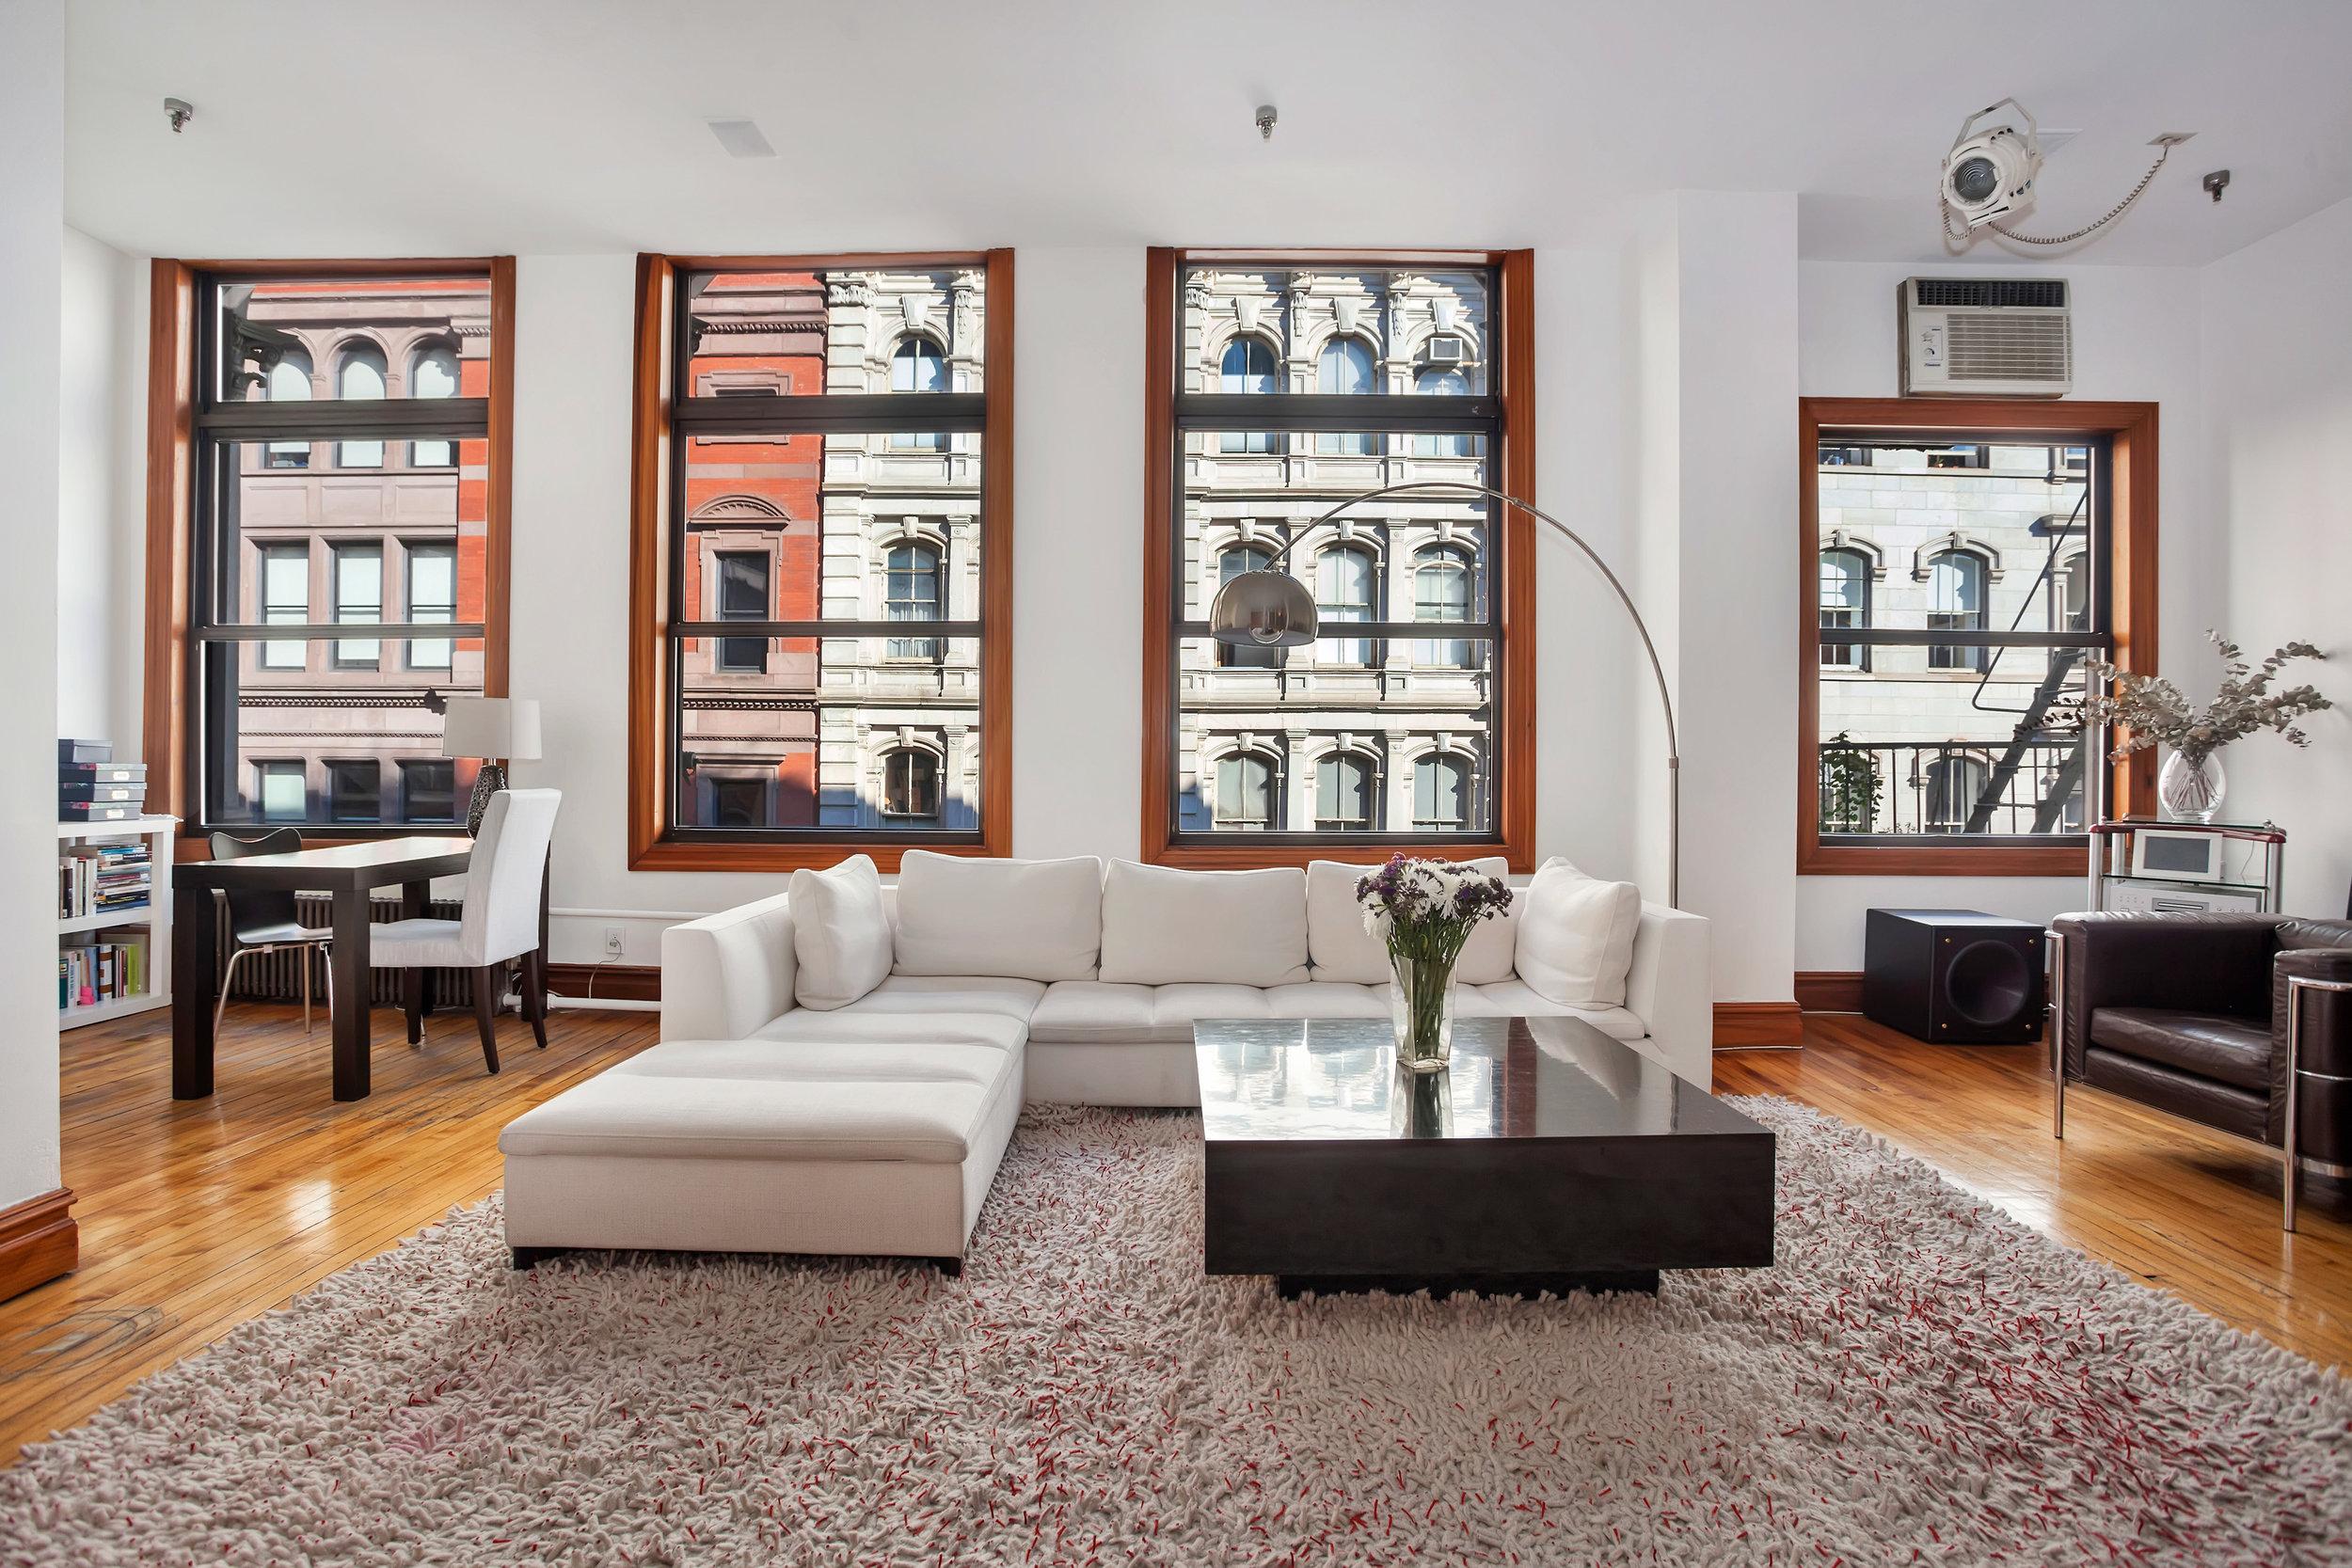 18 East 18th Street, #4W - $3,000,000